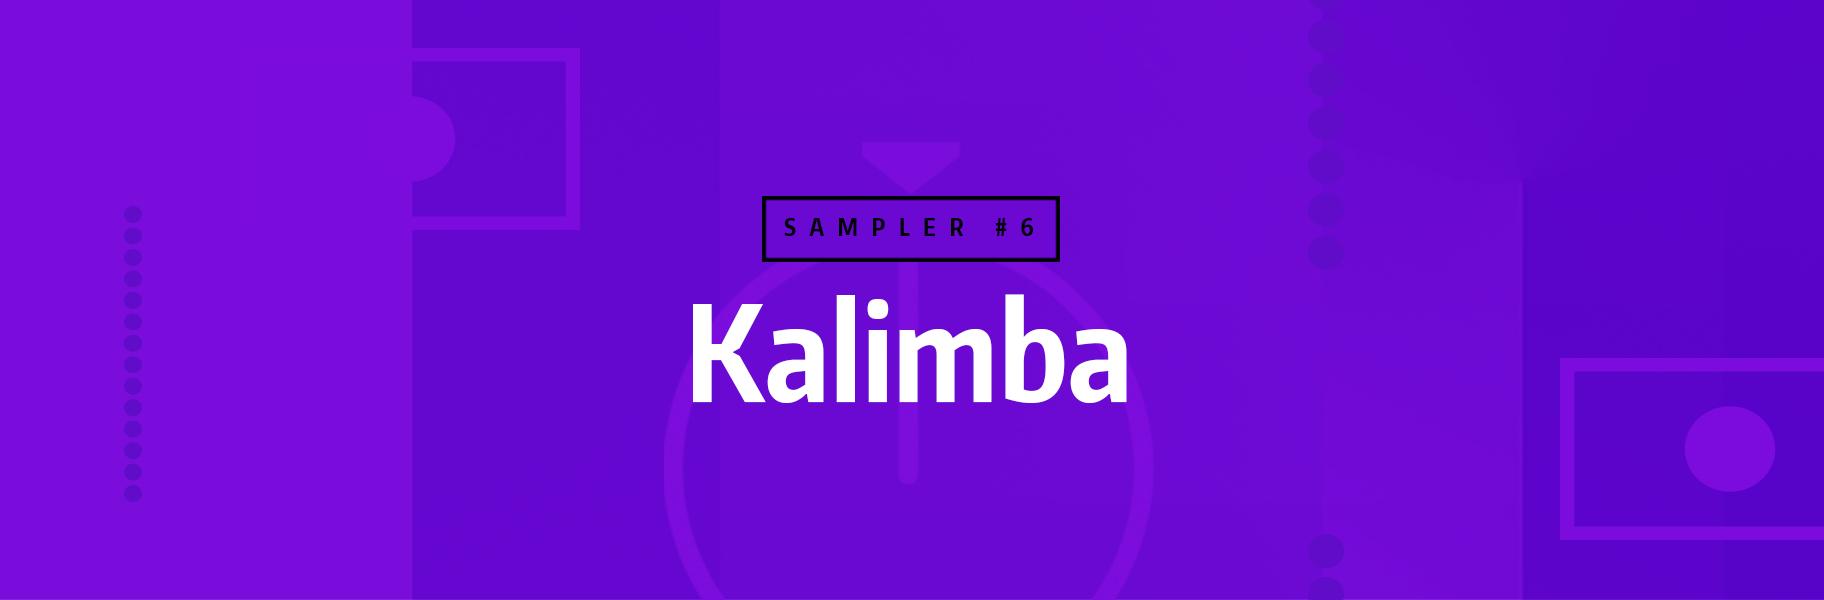 Sampler Instrument #6 - Kalimba